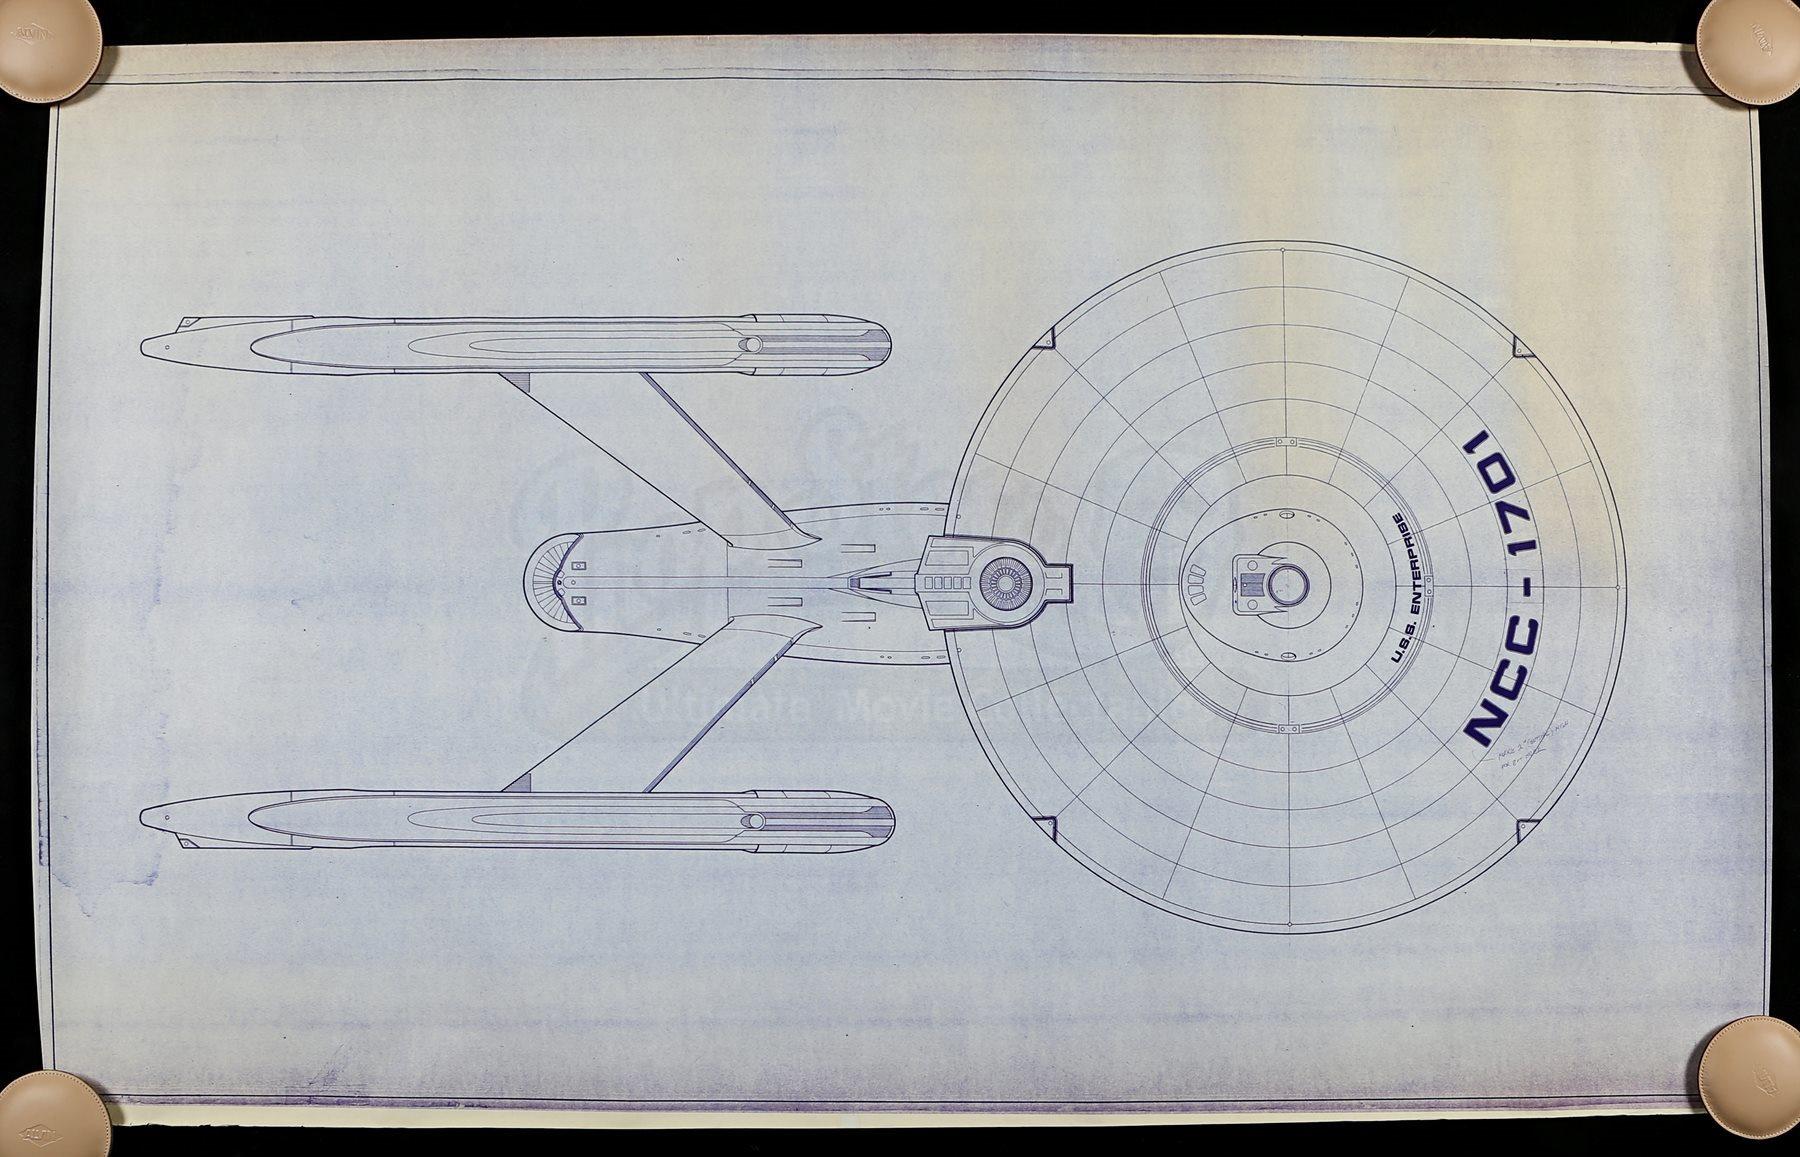 Star trek the motion picture uss enterprise ncc 1701 top for Blueprint cost